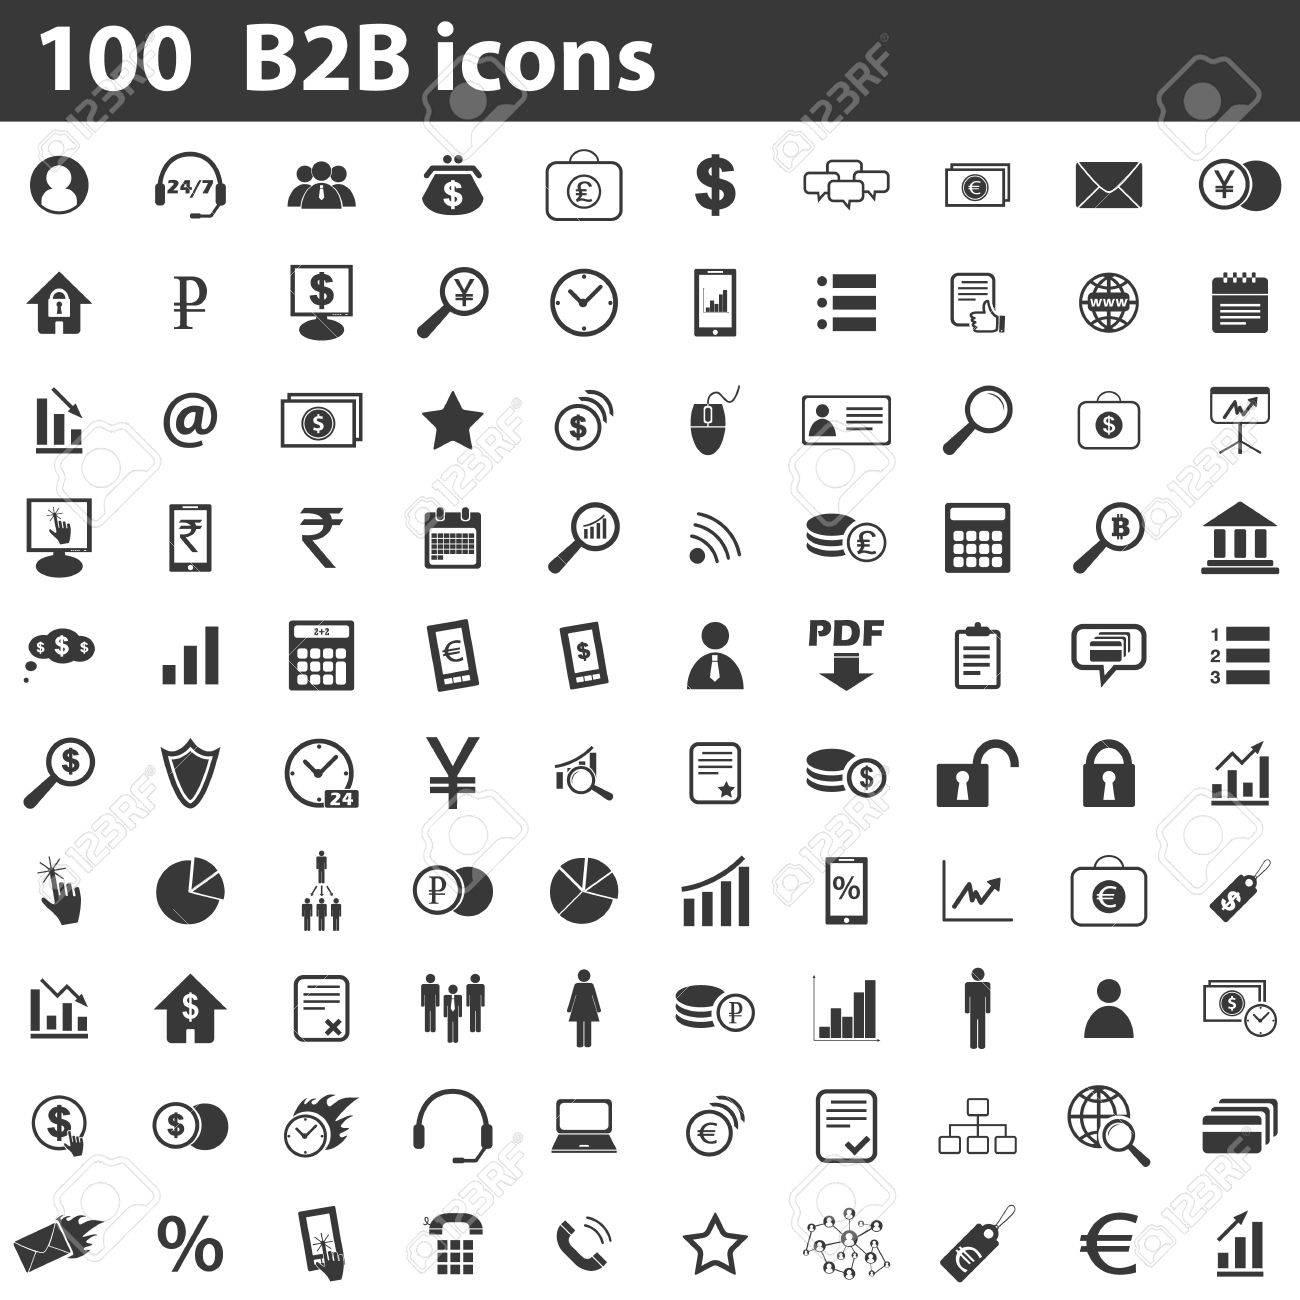 100 B2B icons set, simple black images on white background - 45632603